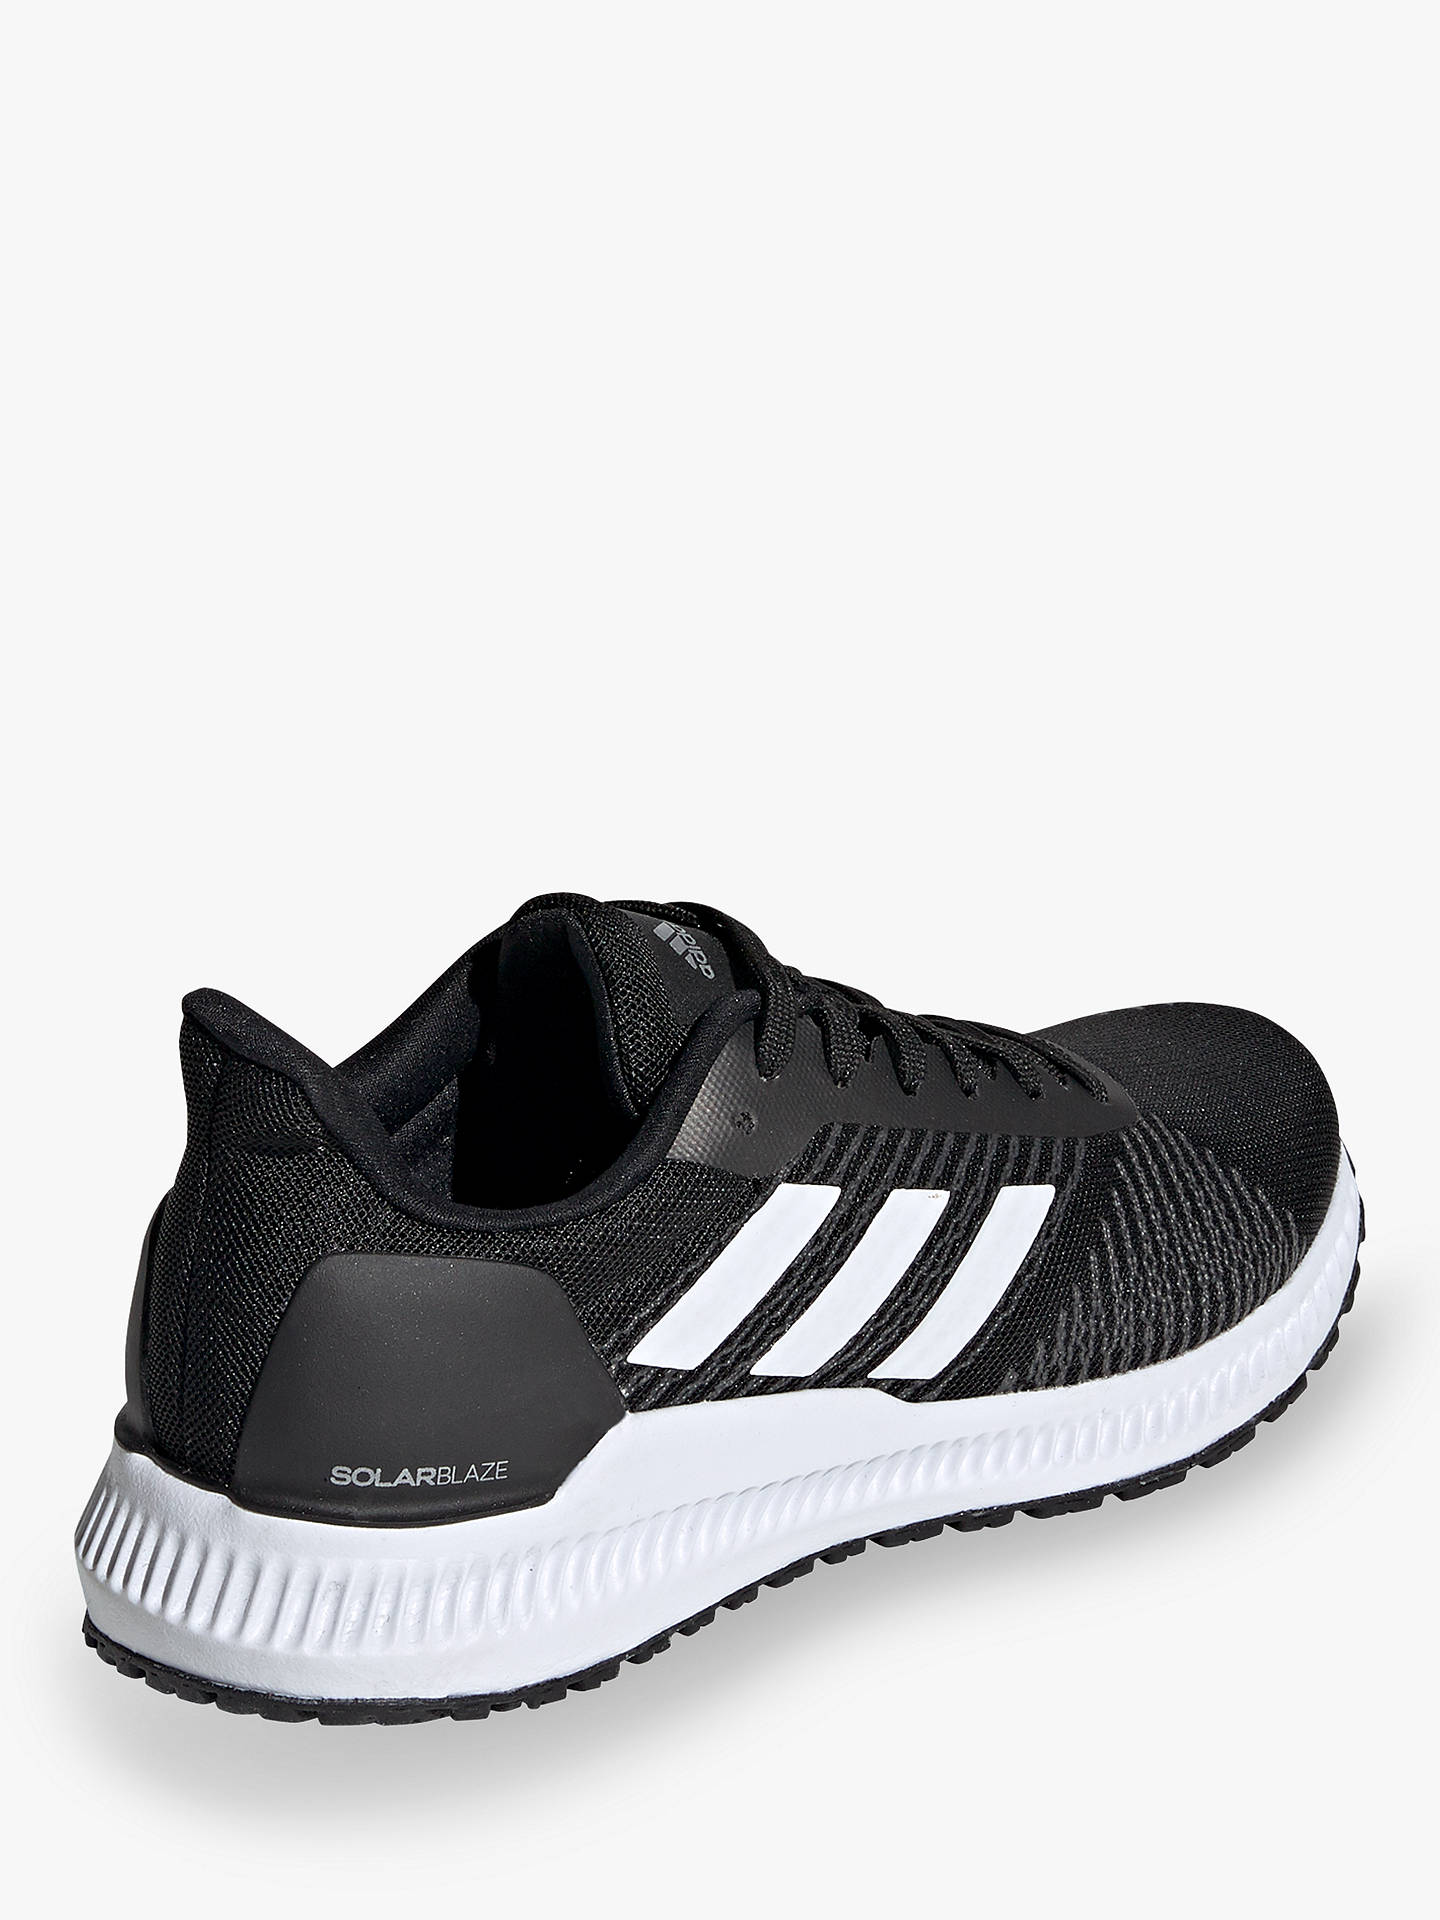 adidas Solar Blaze Women's Running Shoes, Black/White/Grey